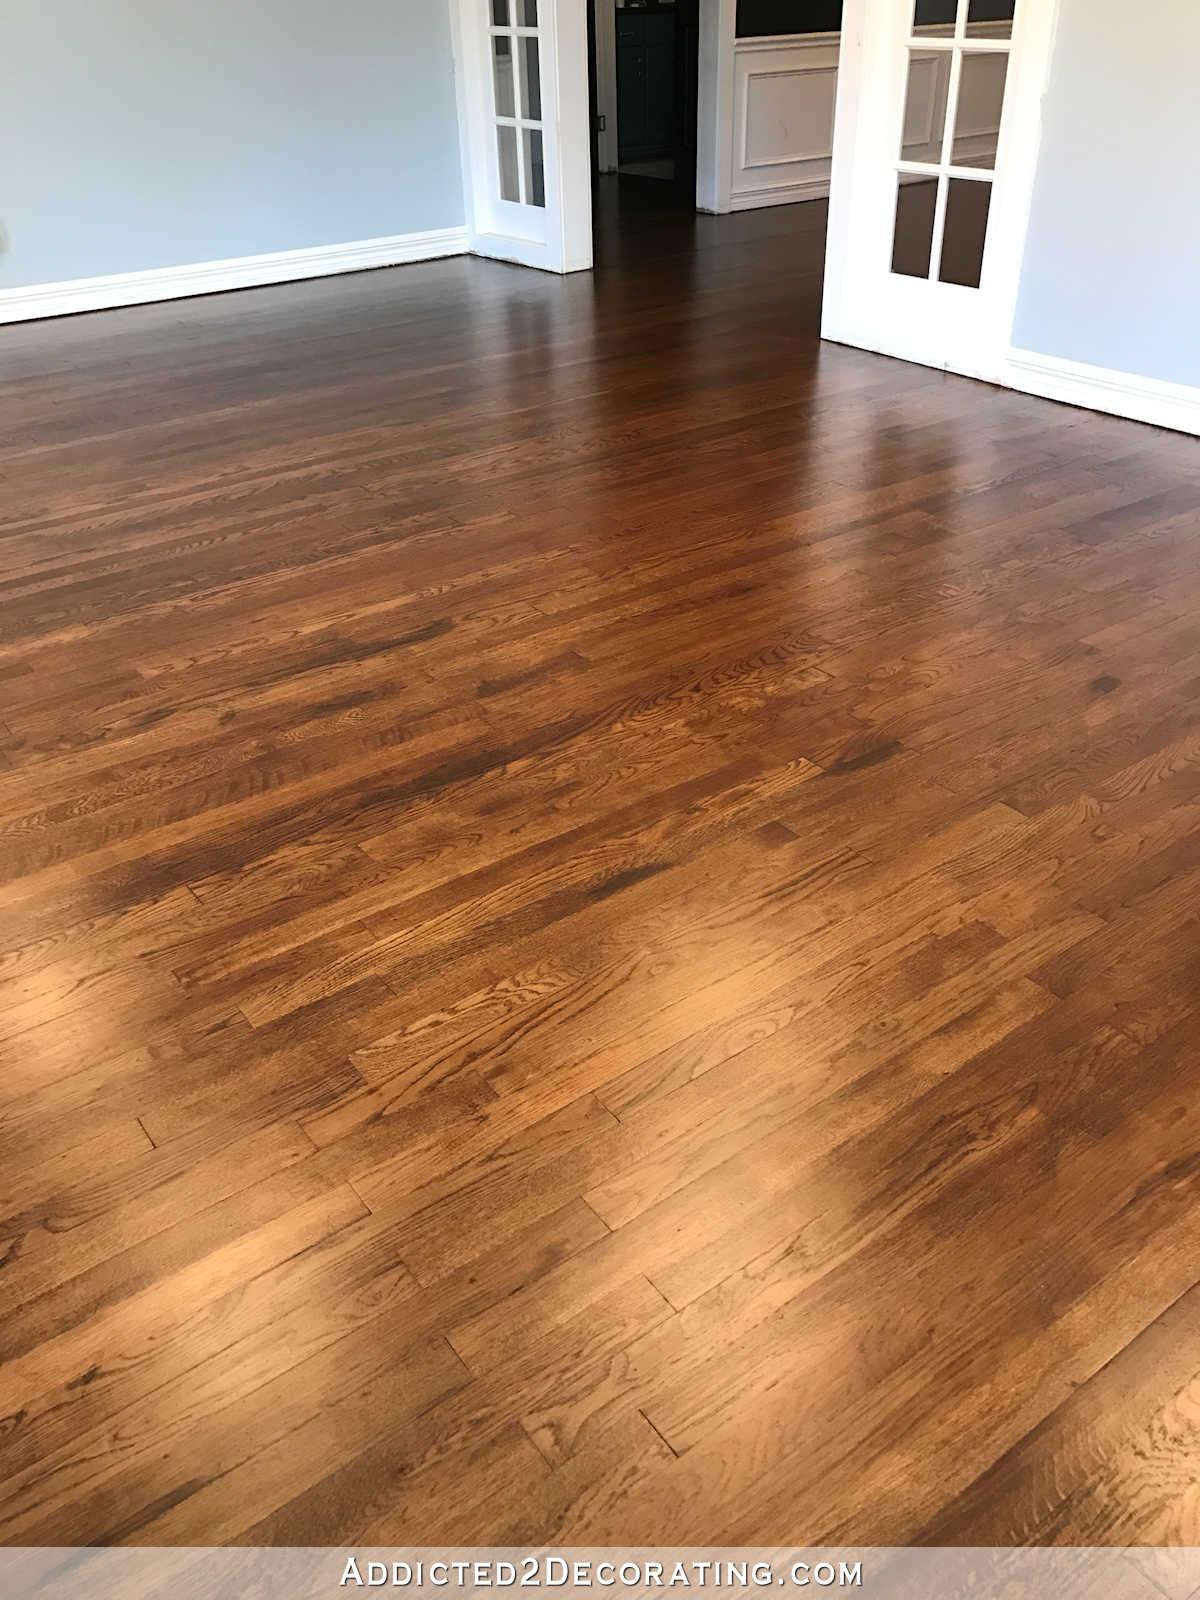 Red oak hardwood flooring refinished red oak hardwood floors - living room, entryway and music room QWFLGSN